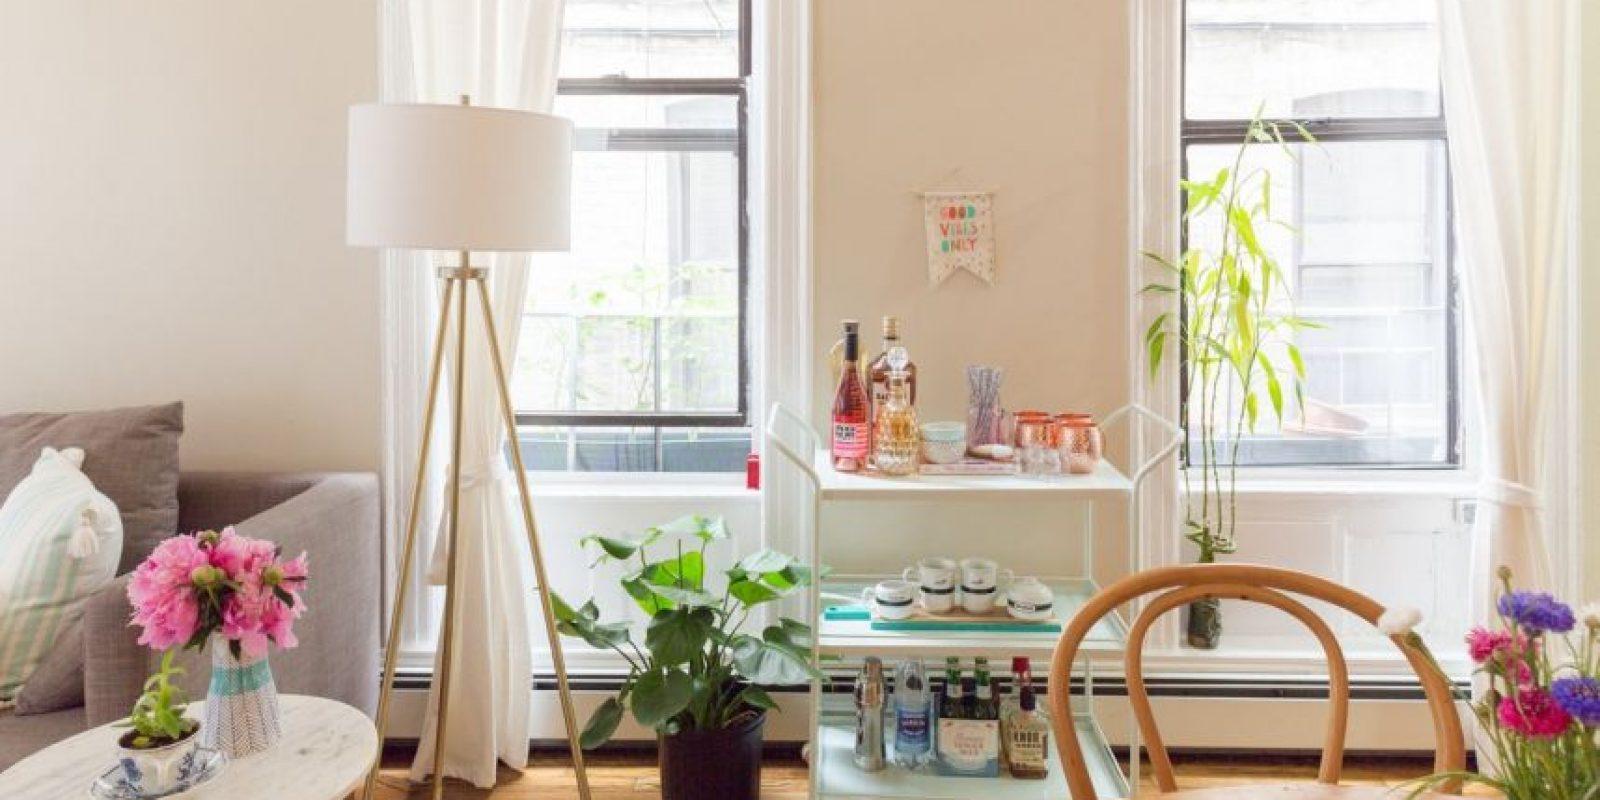 Foto:Apartment Therapy. Imagen Por: